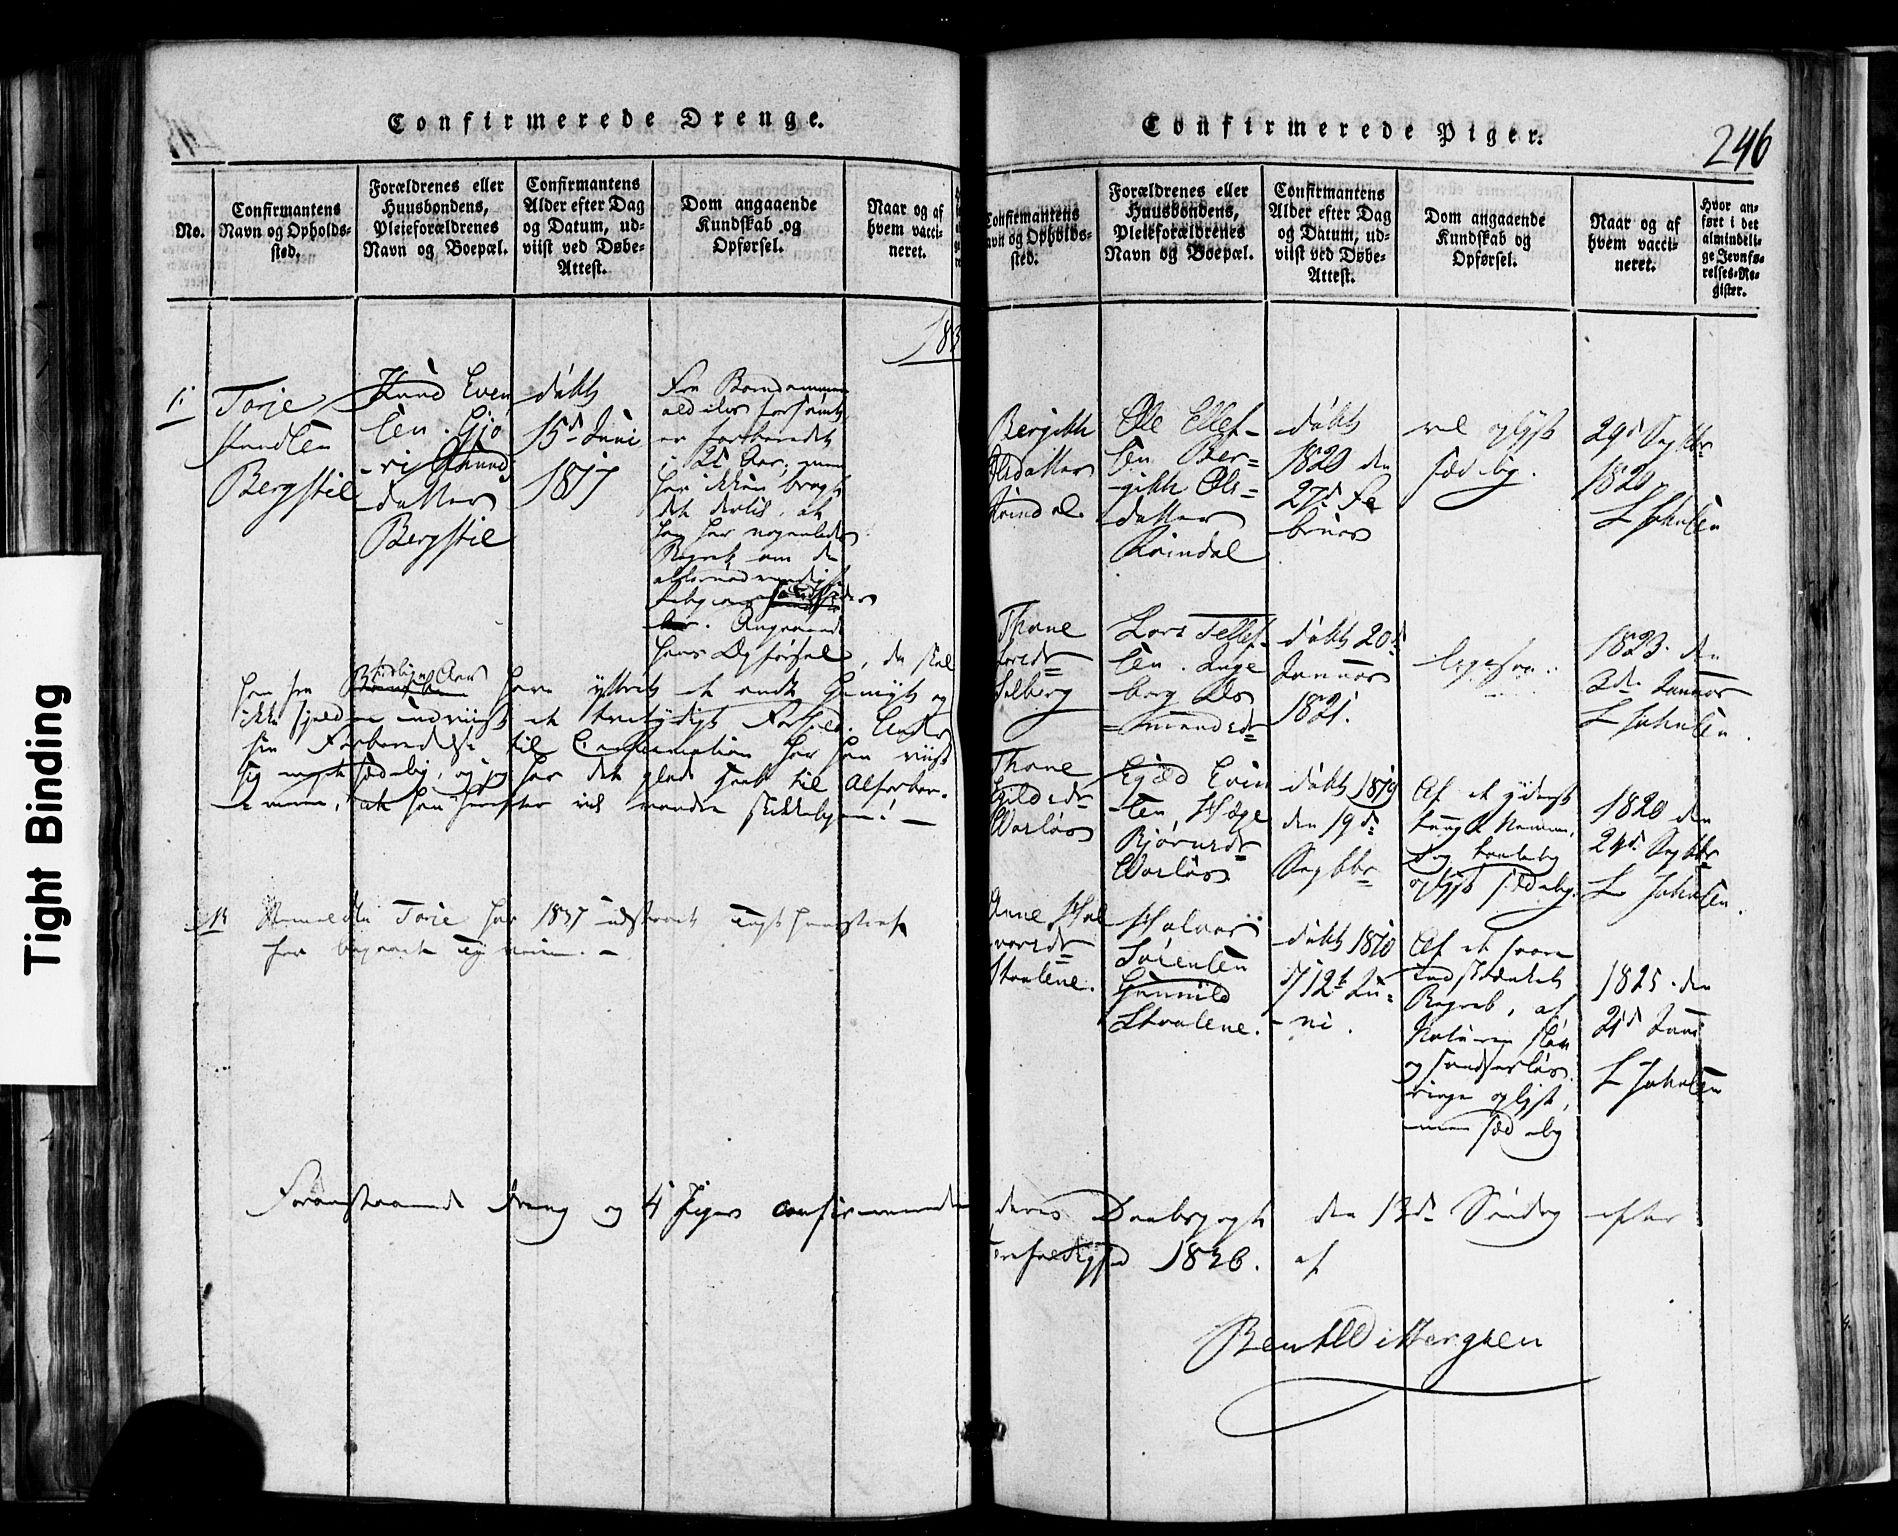 SAKO, Rauland kirkebøker, F/Fa/L0002: Ministerialbok nr. 2, 1815-1860, s. 246